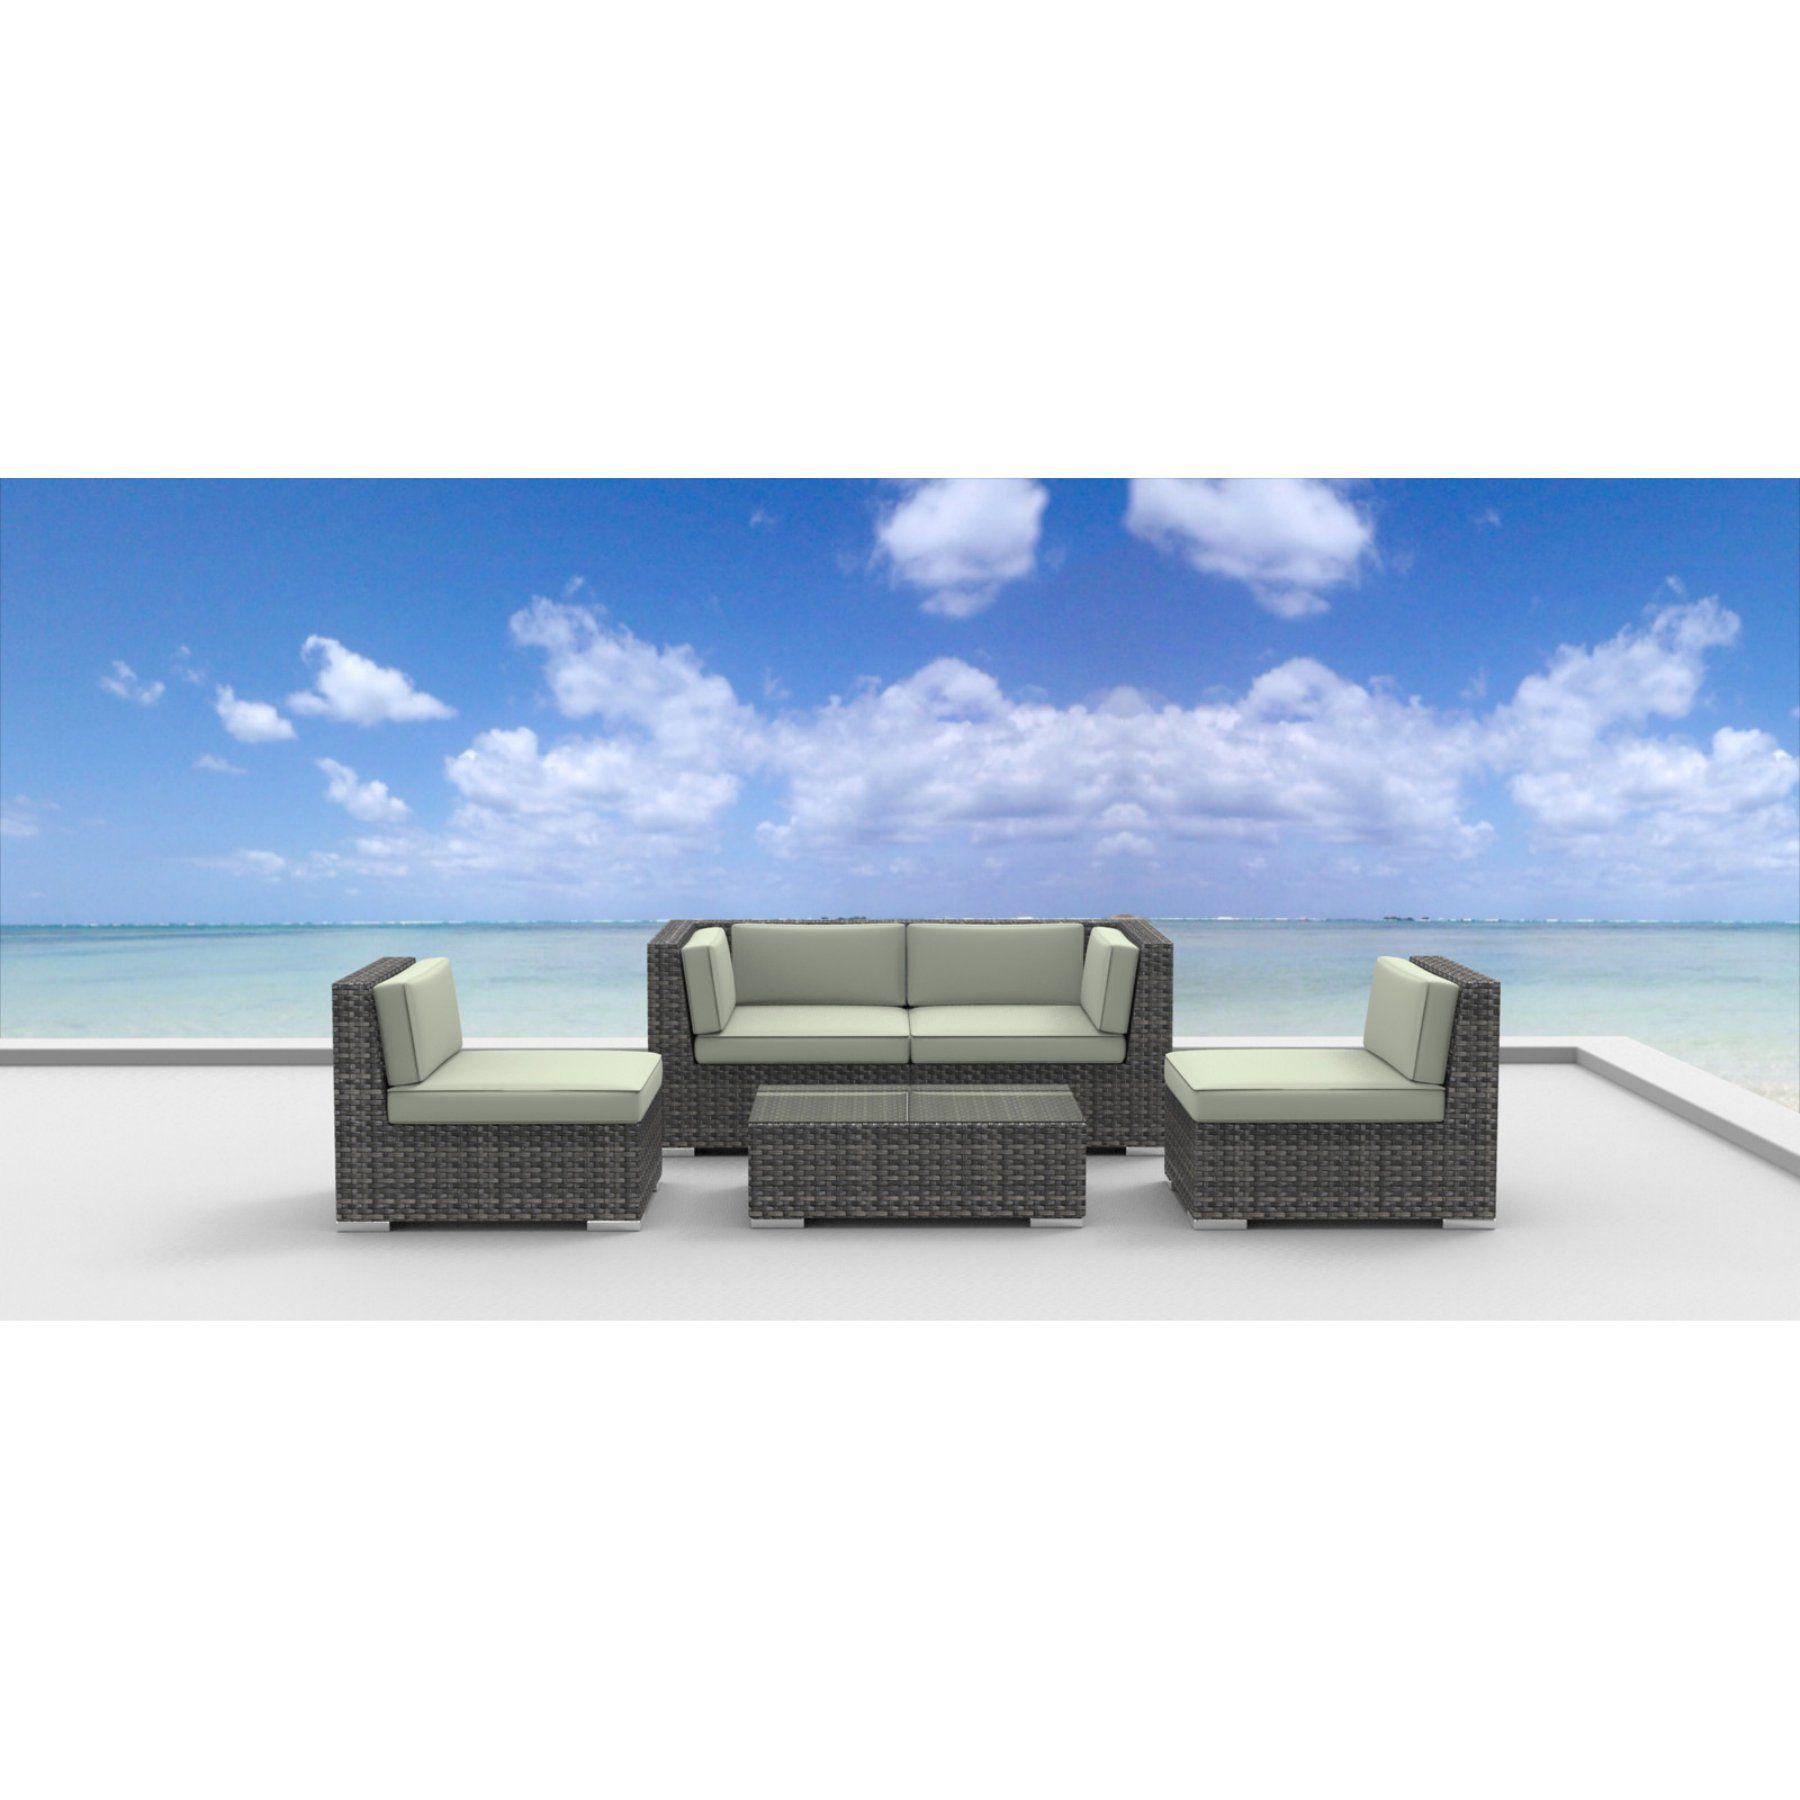 Furnishing Rio 5 Piece Outdoor Wicker Patio Furniture Set 5A RIO